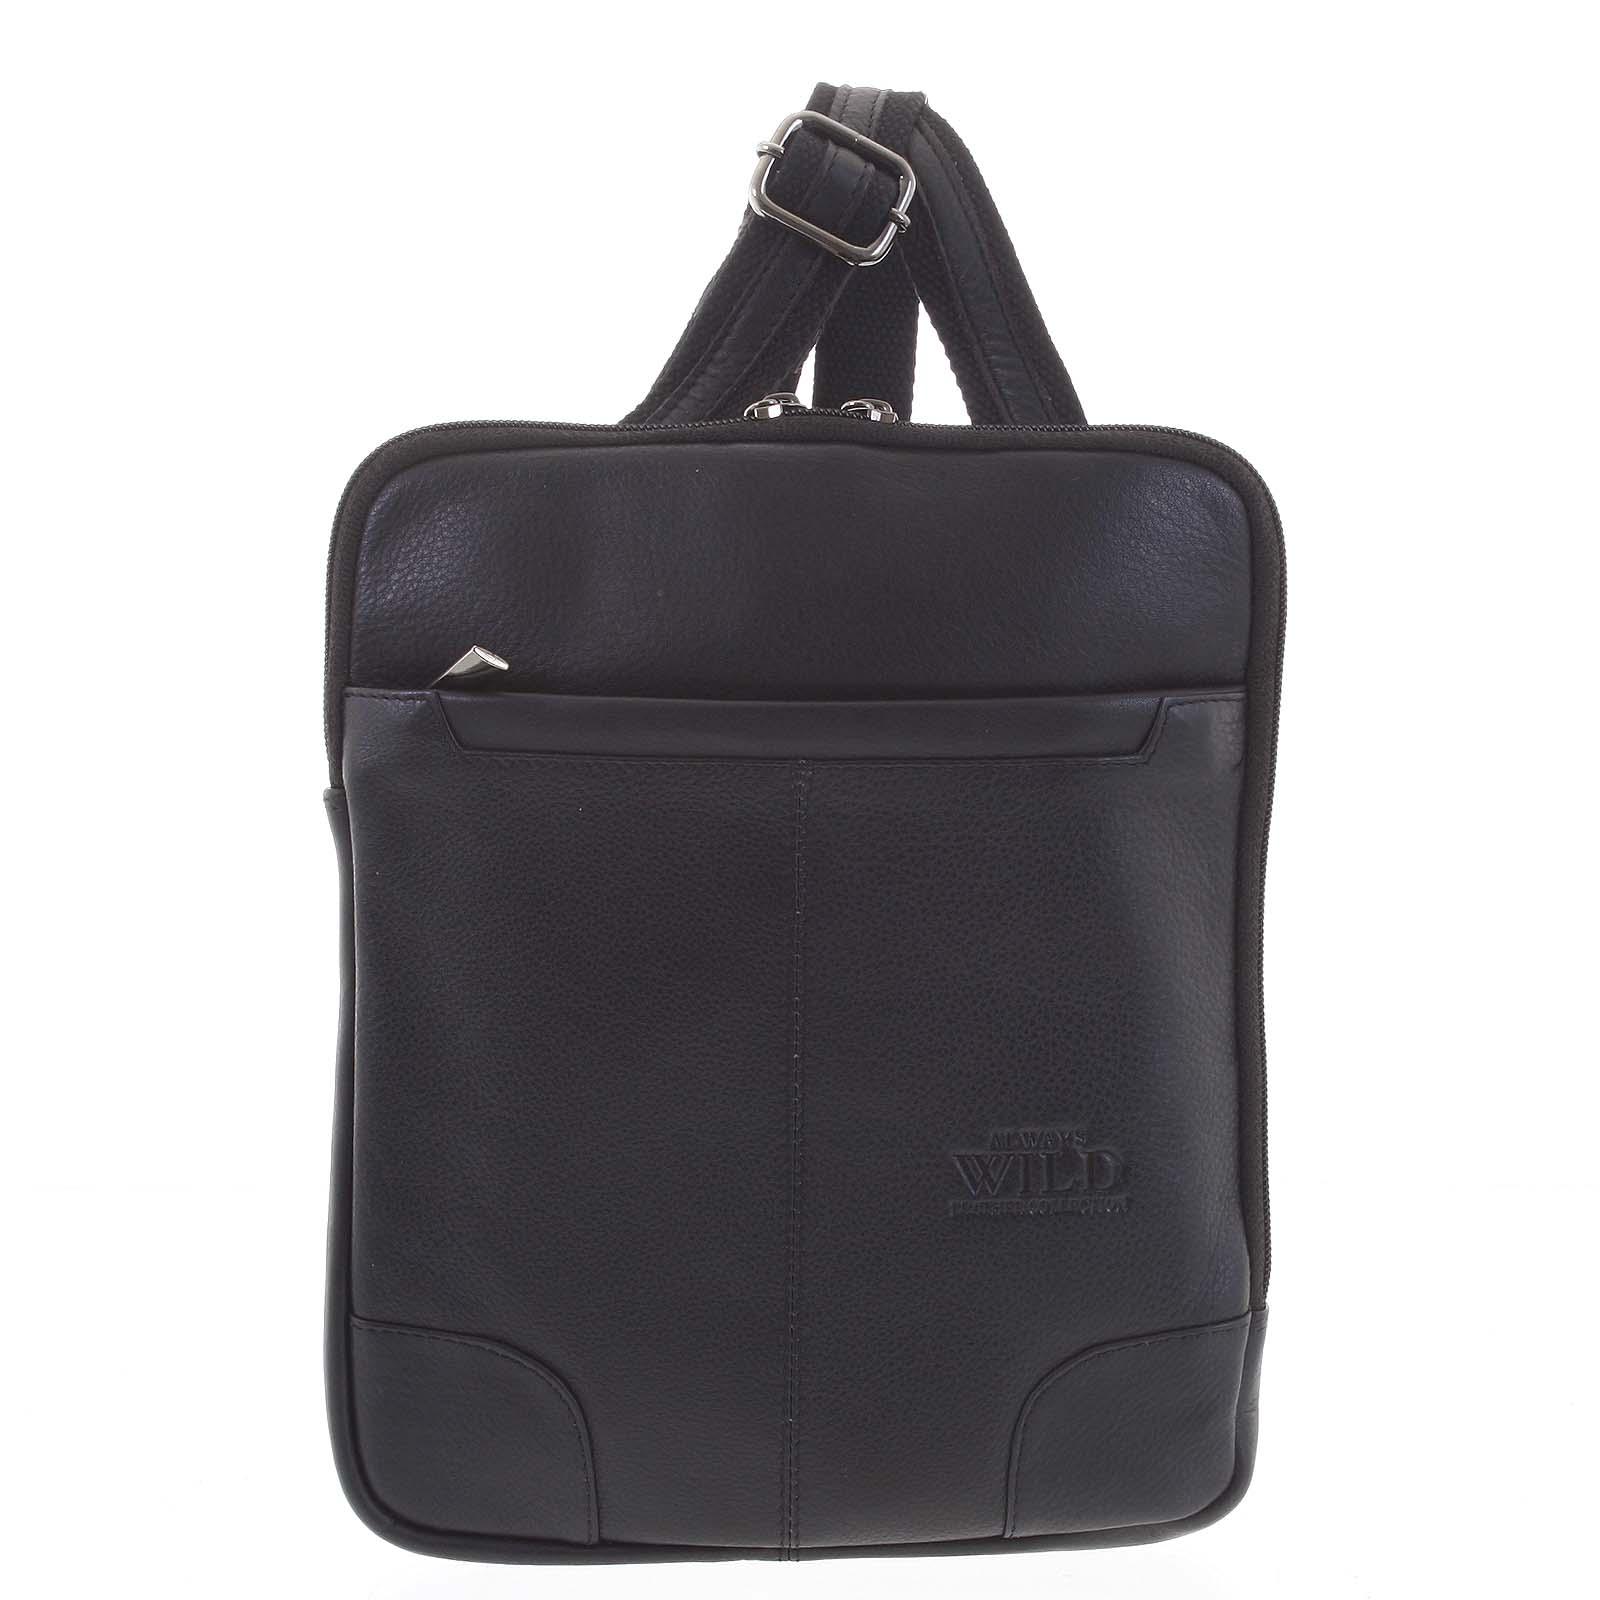 Stylová pánská kožená taška černá - WILD Eito